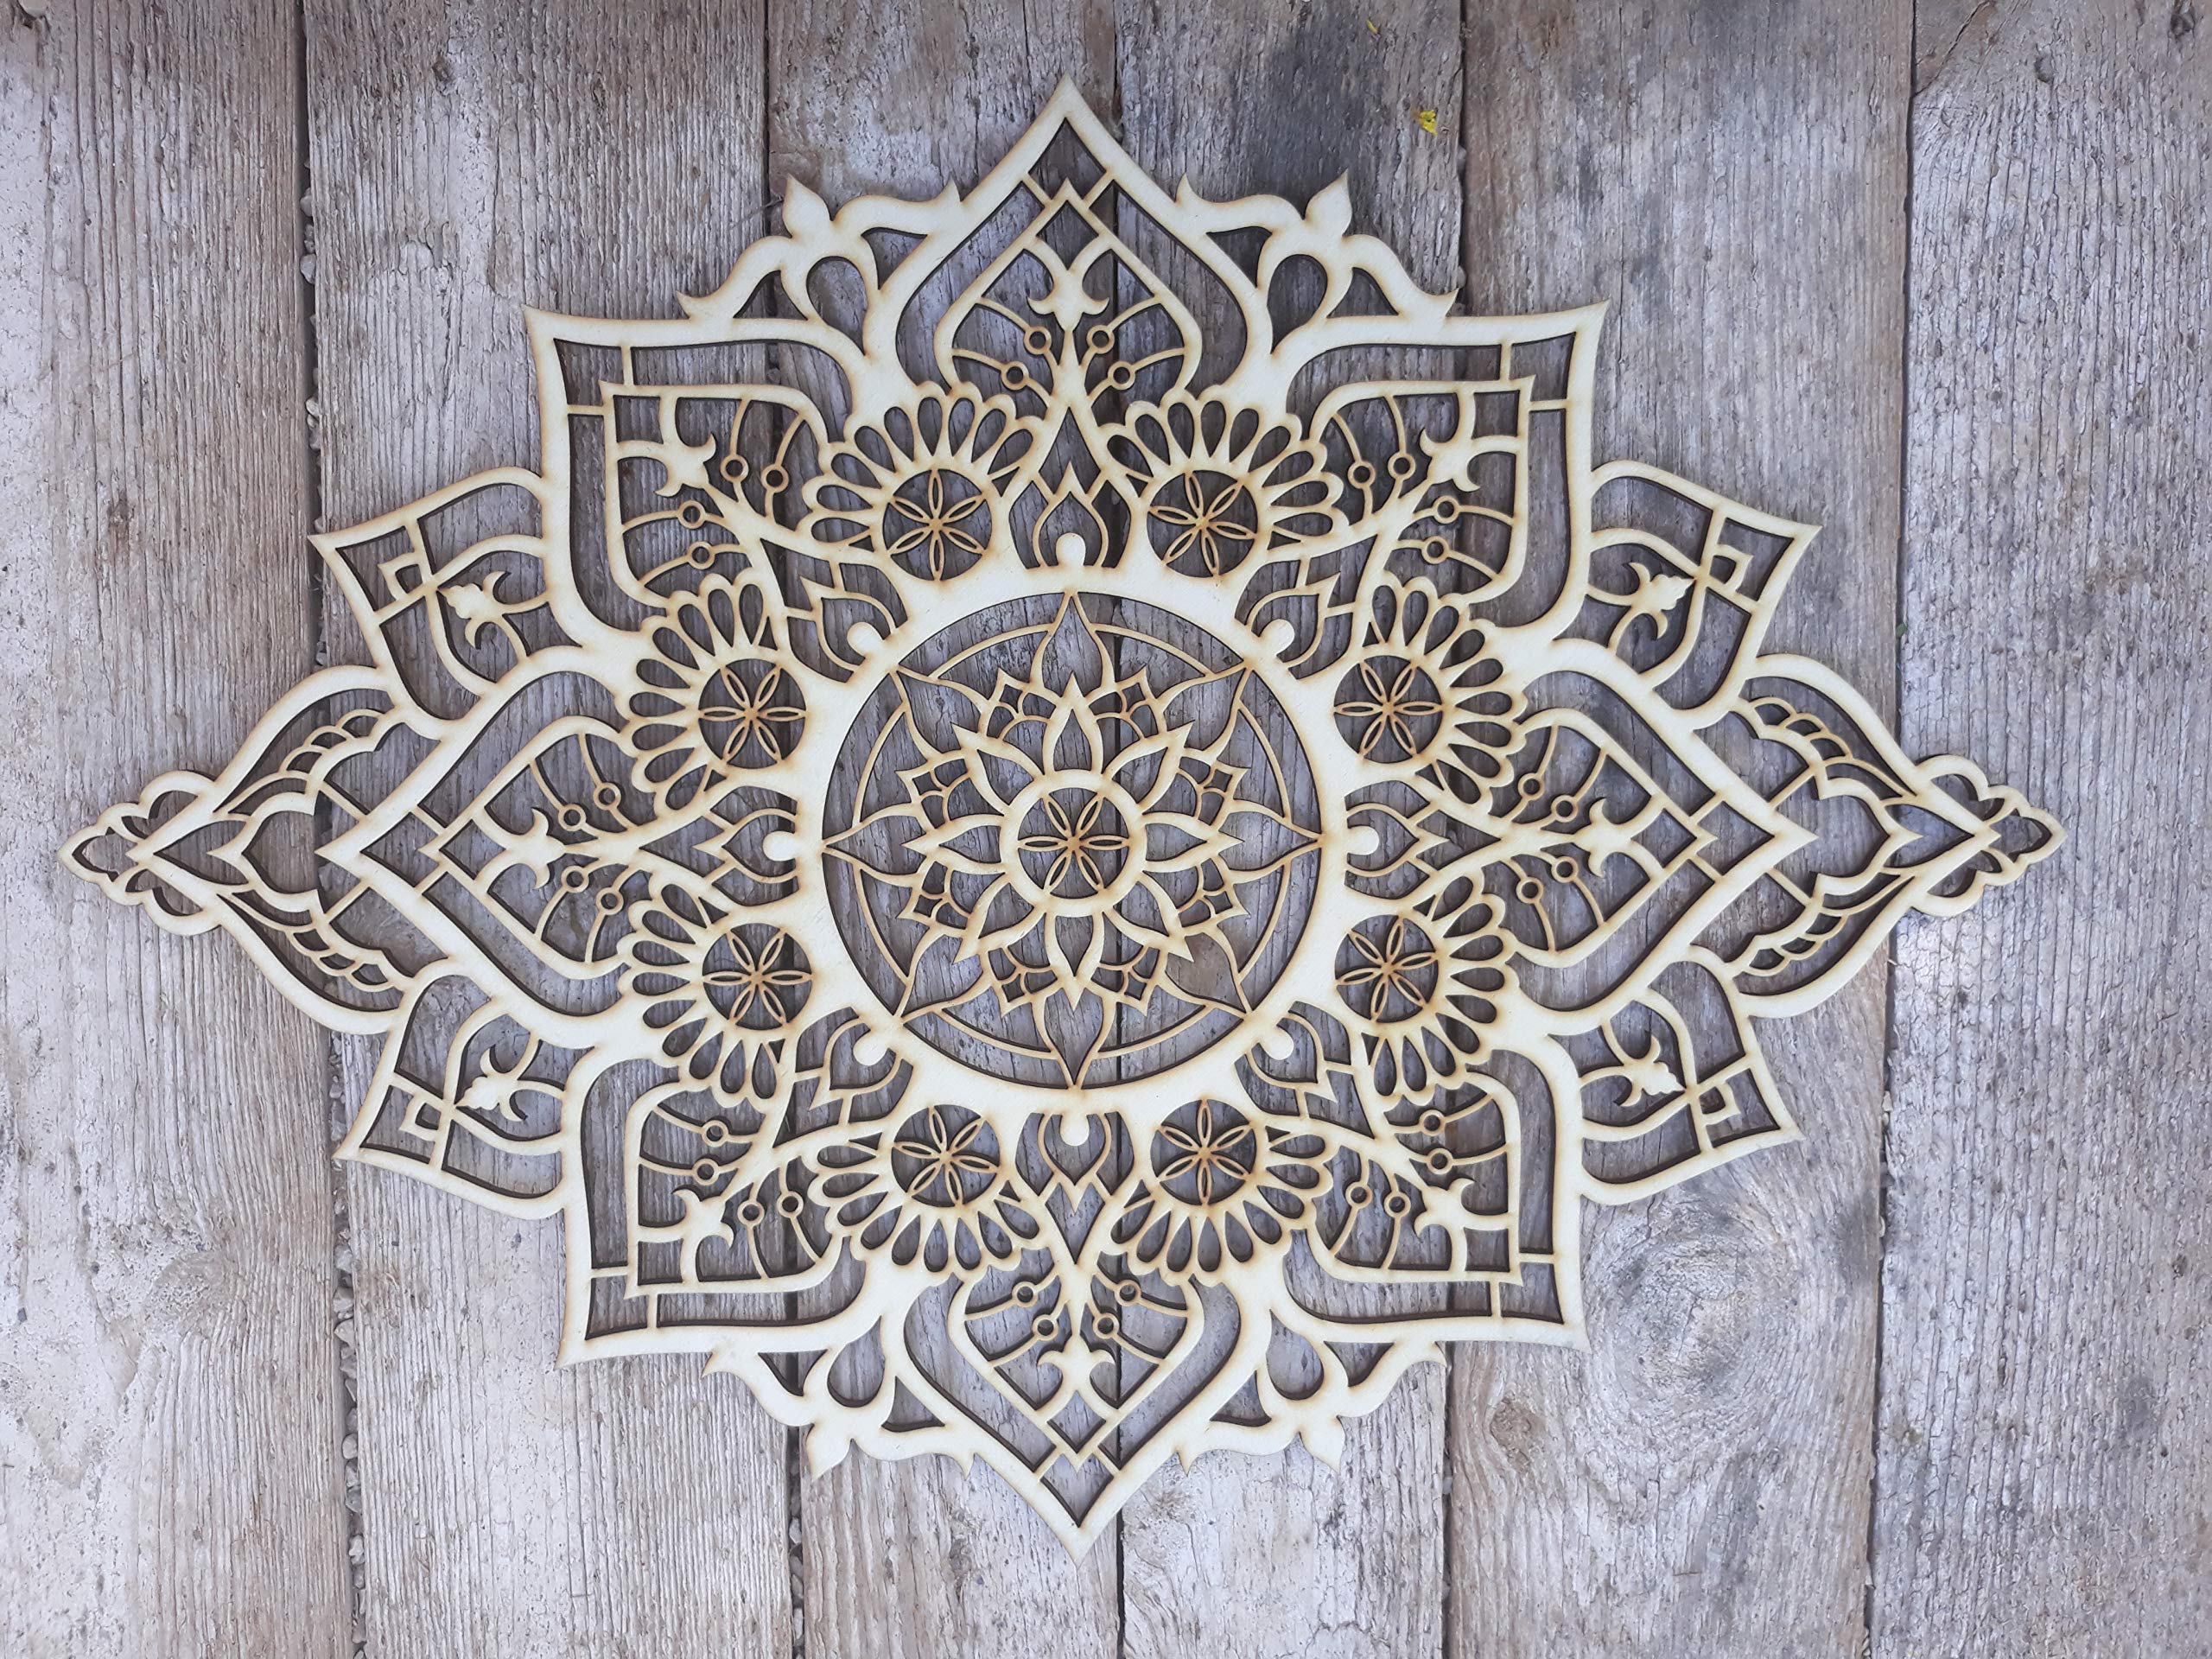 Mandala Wood Home Decor, Boho Ethnic Housewarming Wall Hanging, Morrocan Indian Wall Art, Sacred Geometry Yoga Studio, Unique Handmade Spiritual Gift